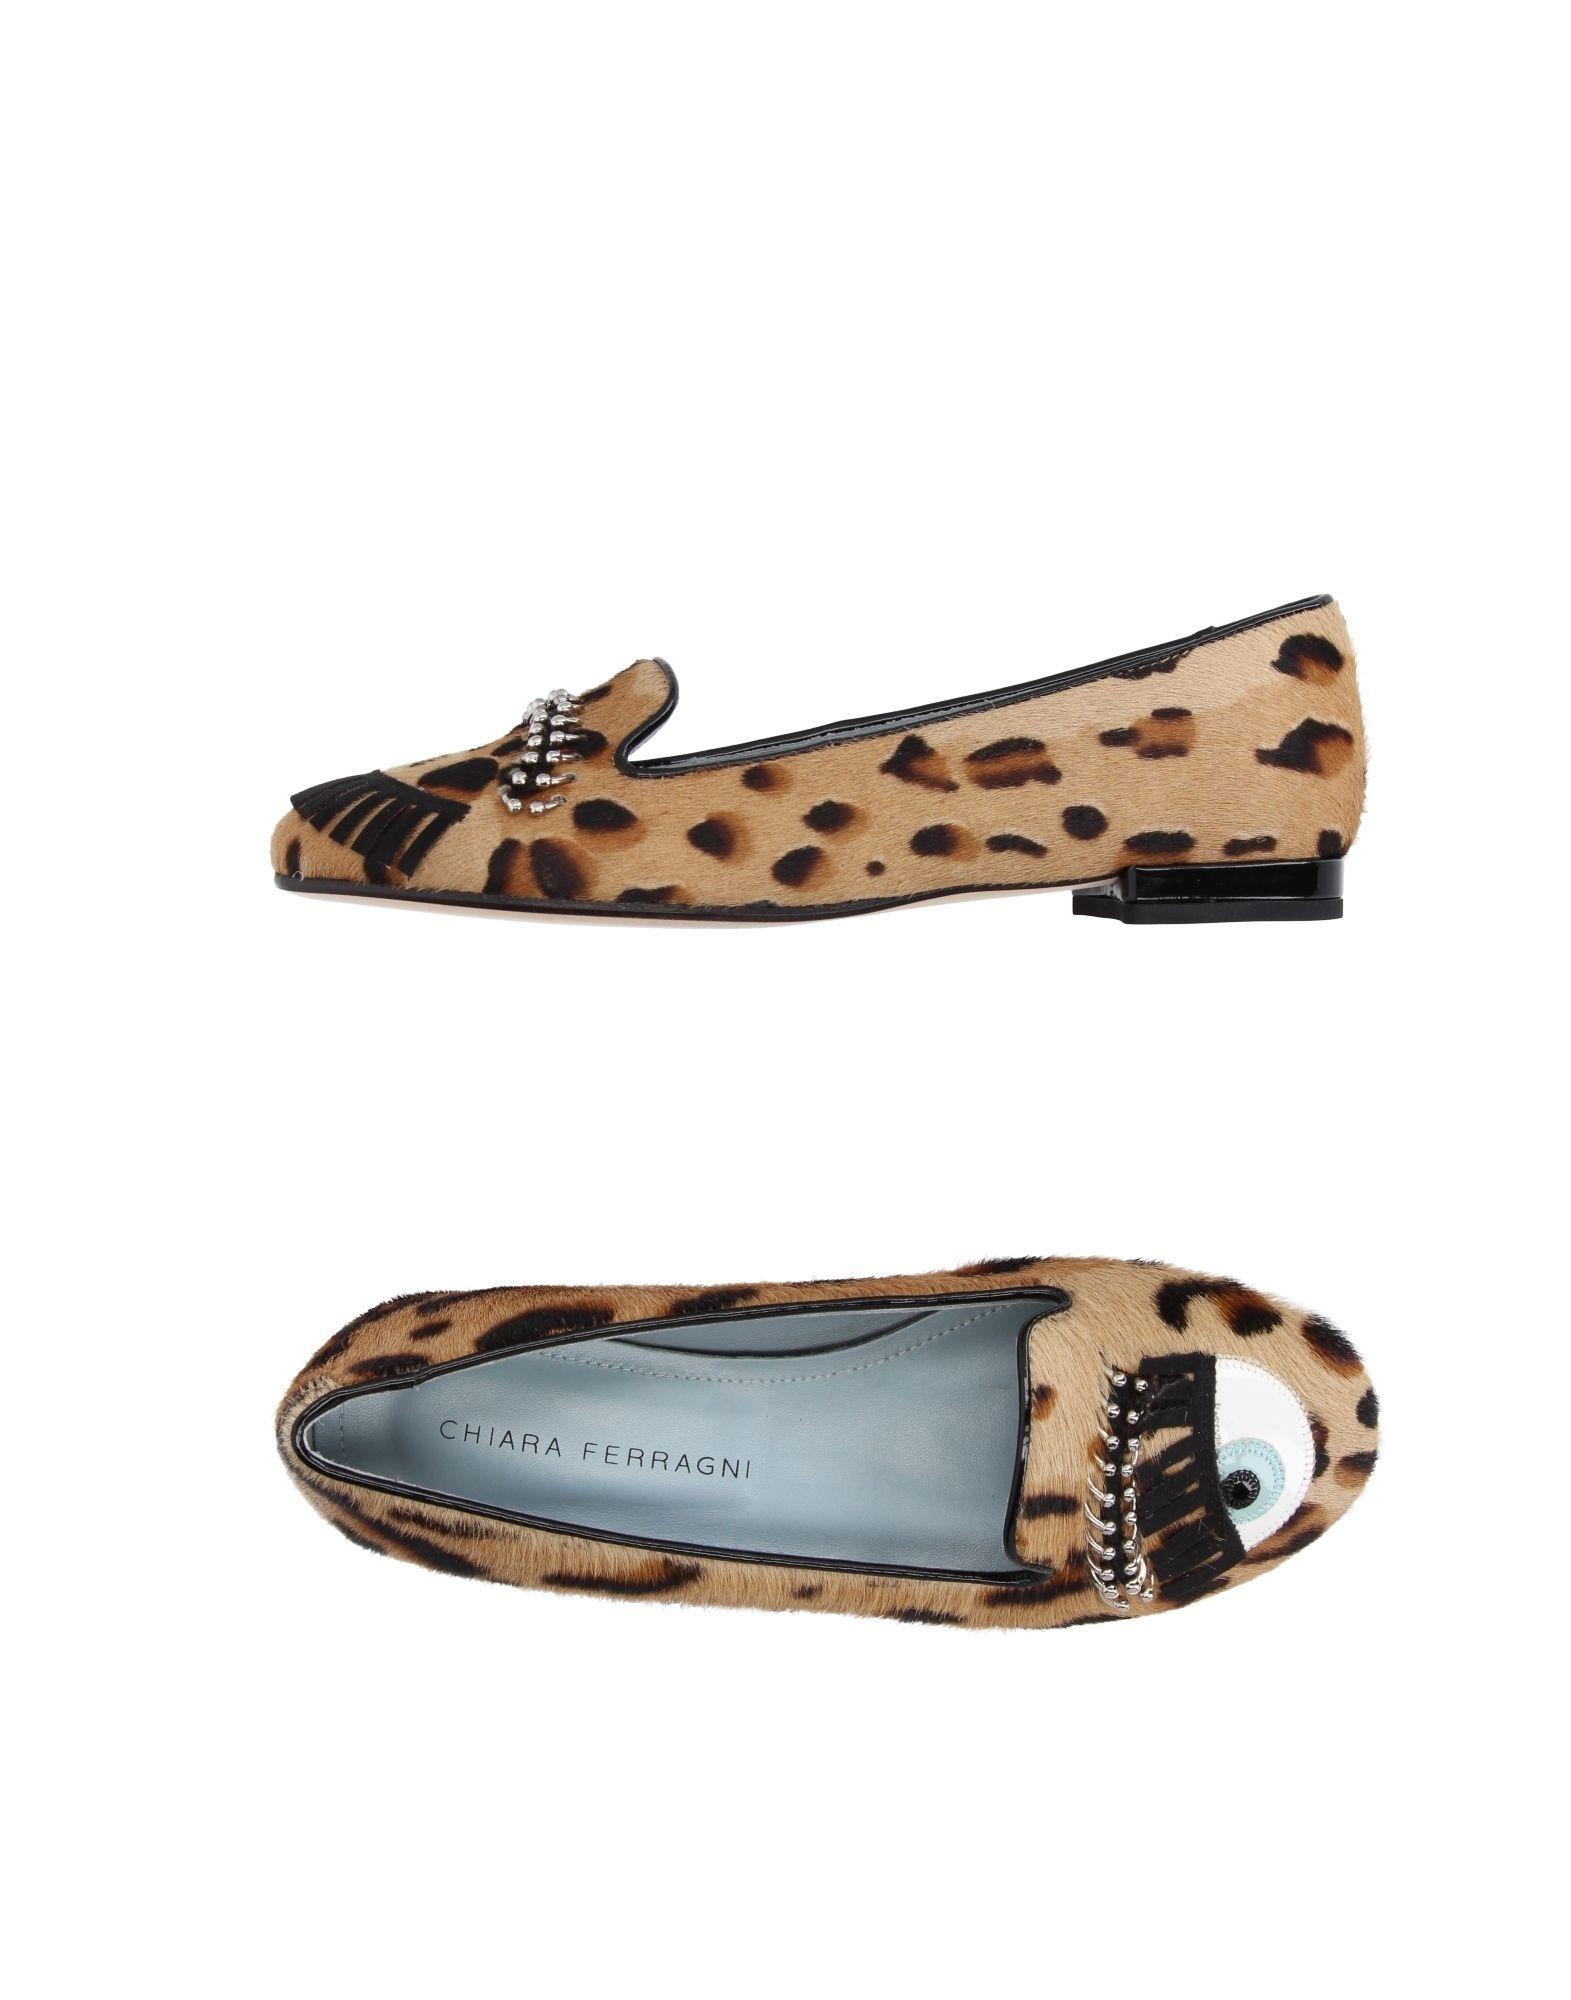 Chiara Ferragni Mokassins Damen  11212379CIGut aussehende strapazierfähige Schuhe